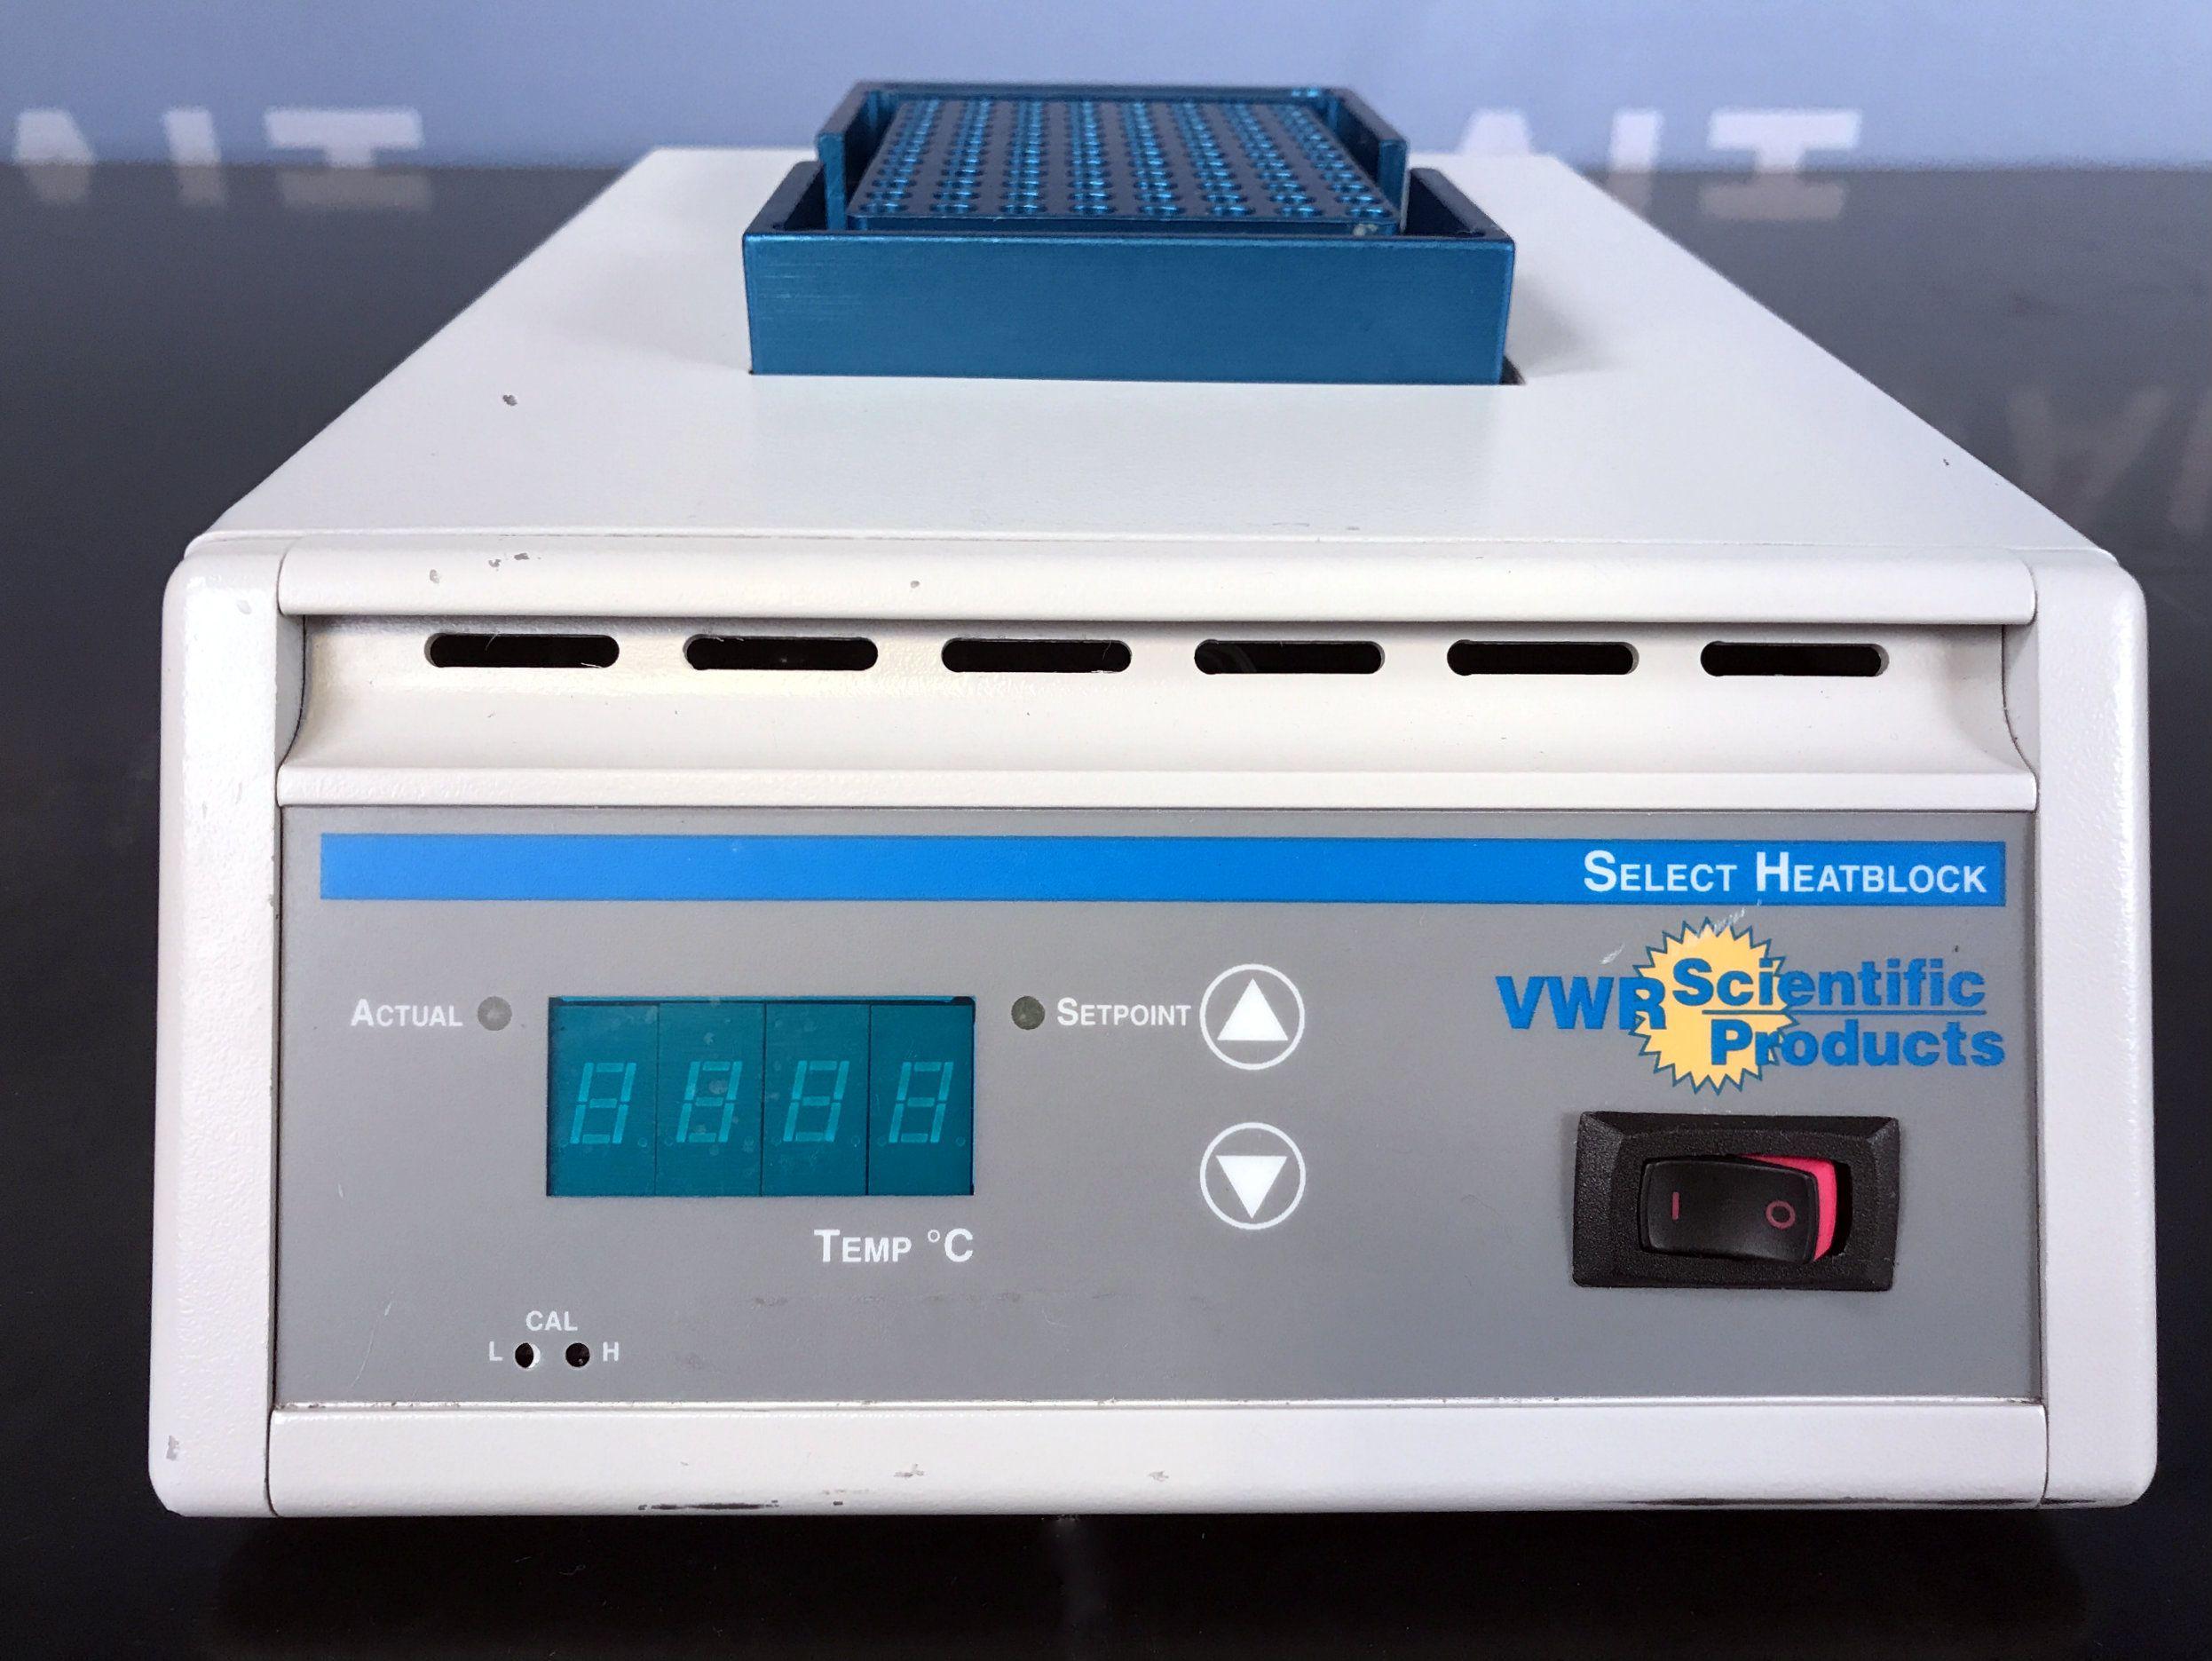 VWR 13259-052 Digital Dual Heat Block